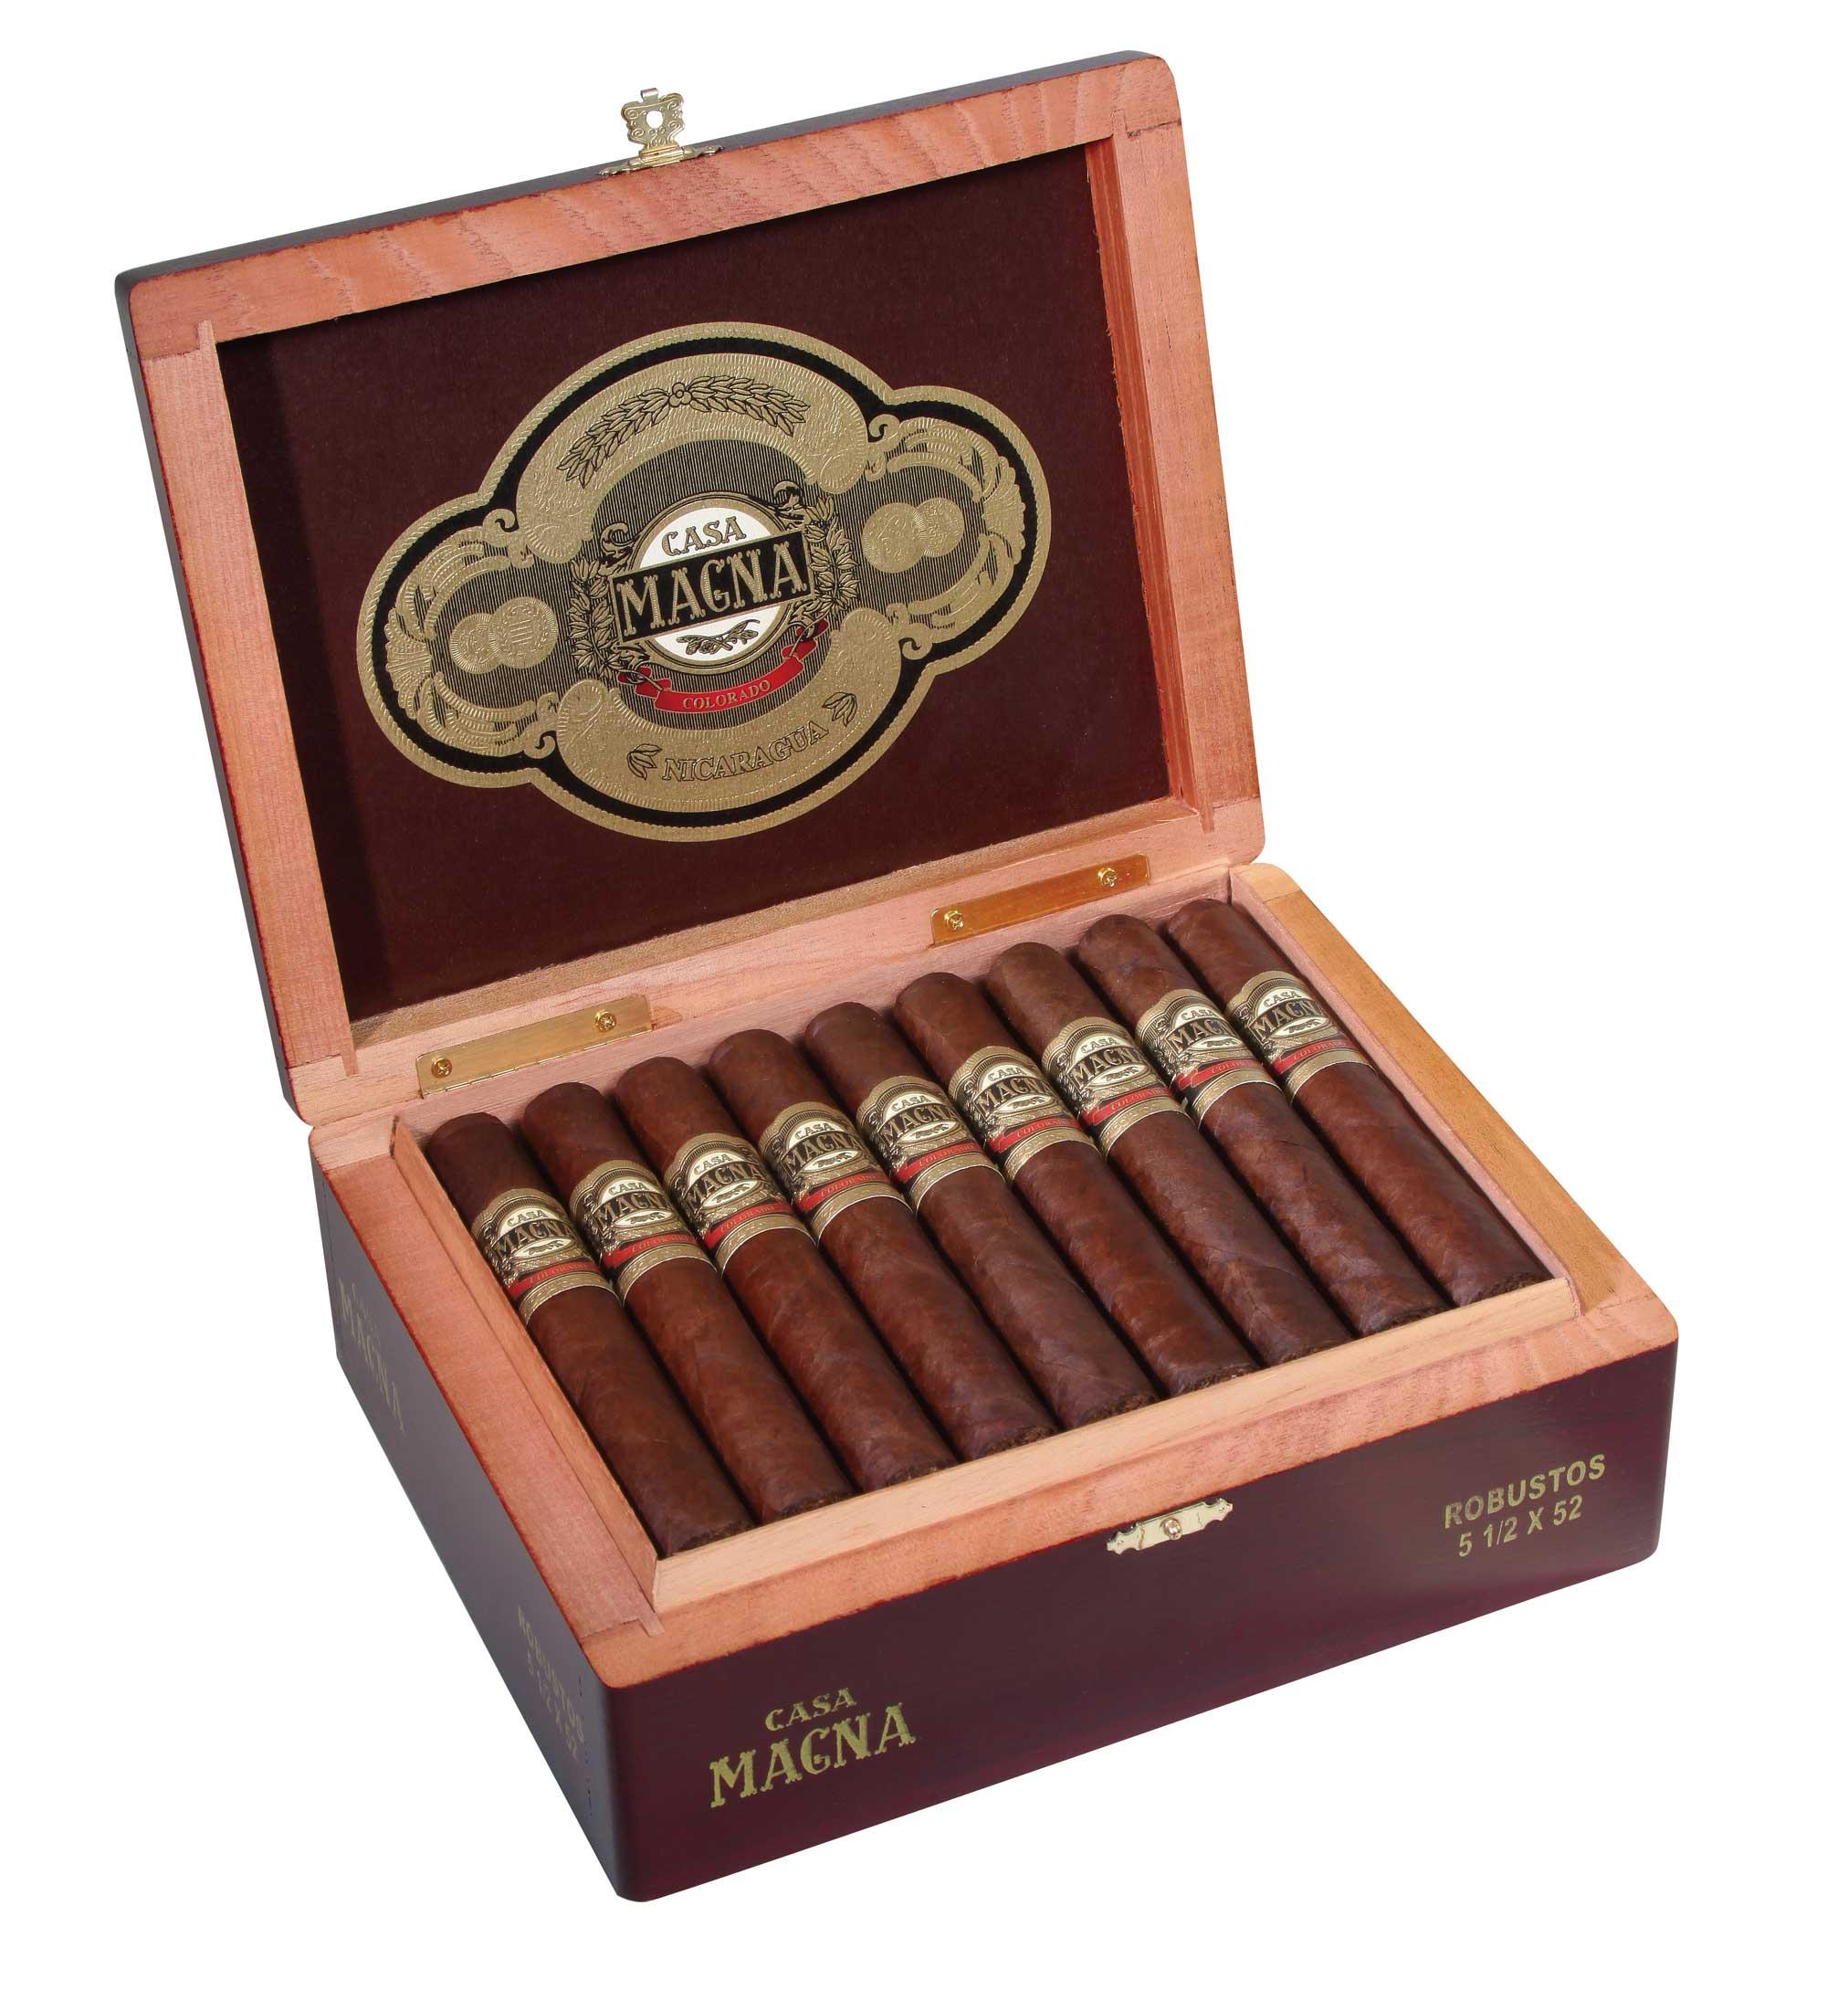 Casa Magna Colorado Cigars